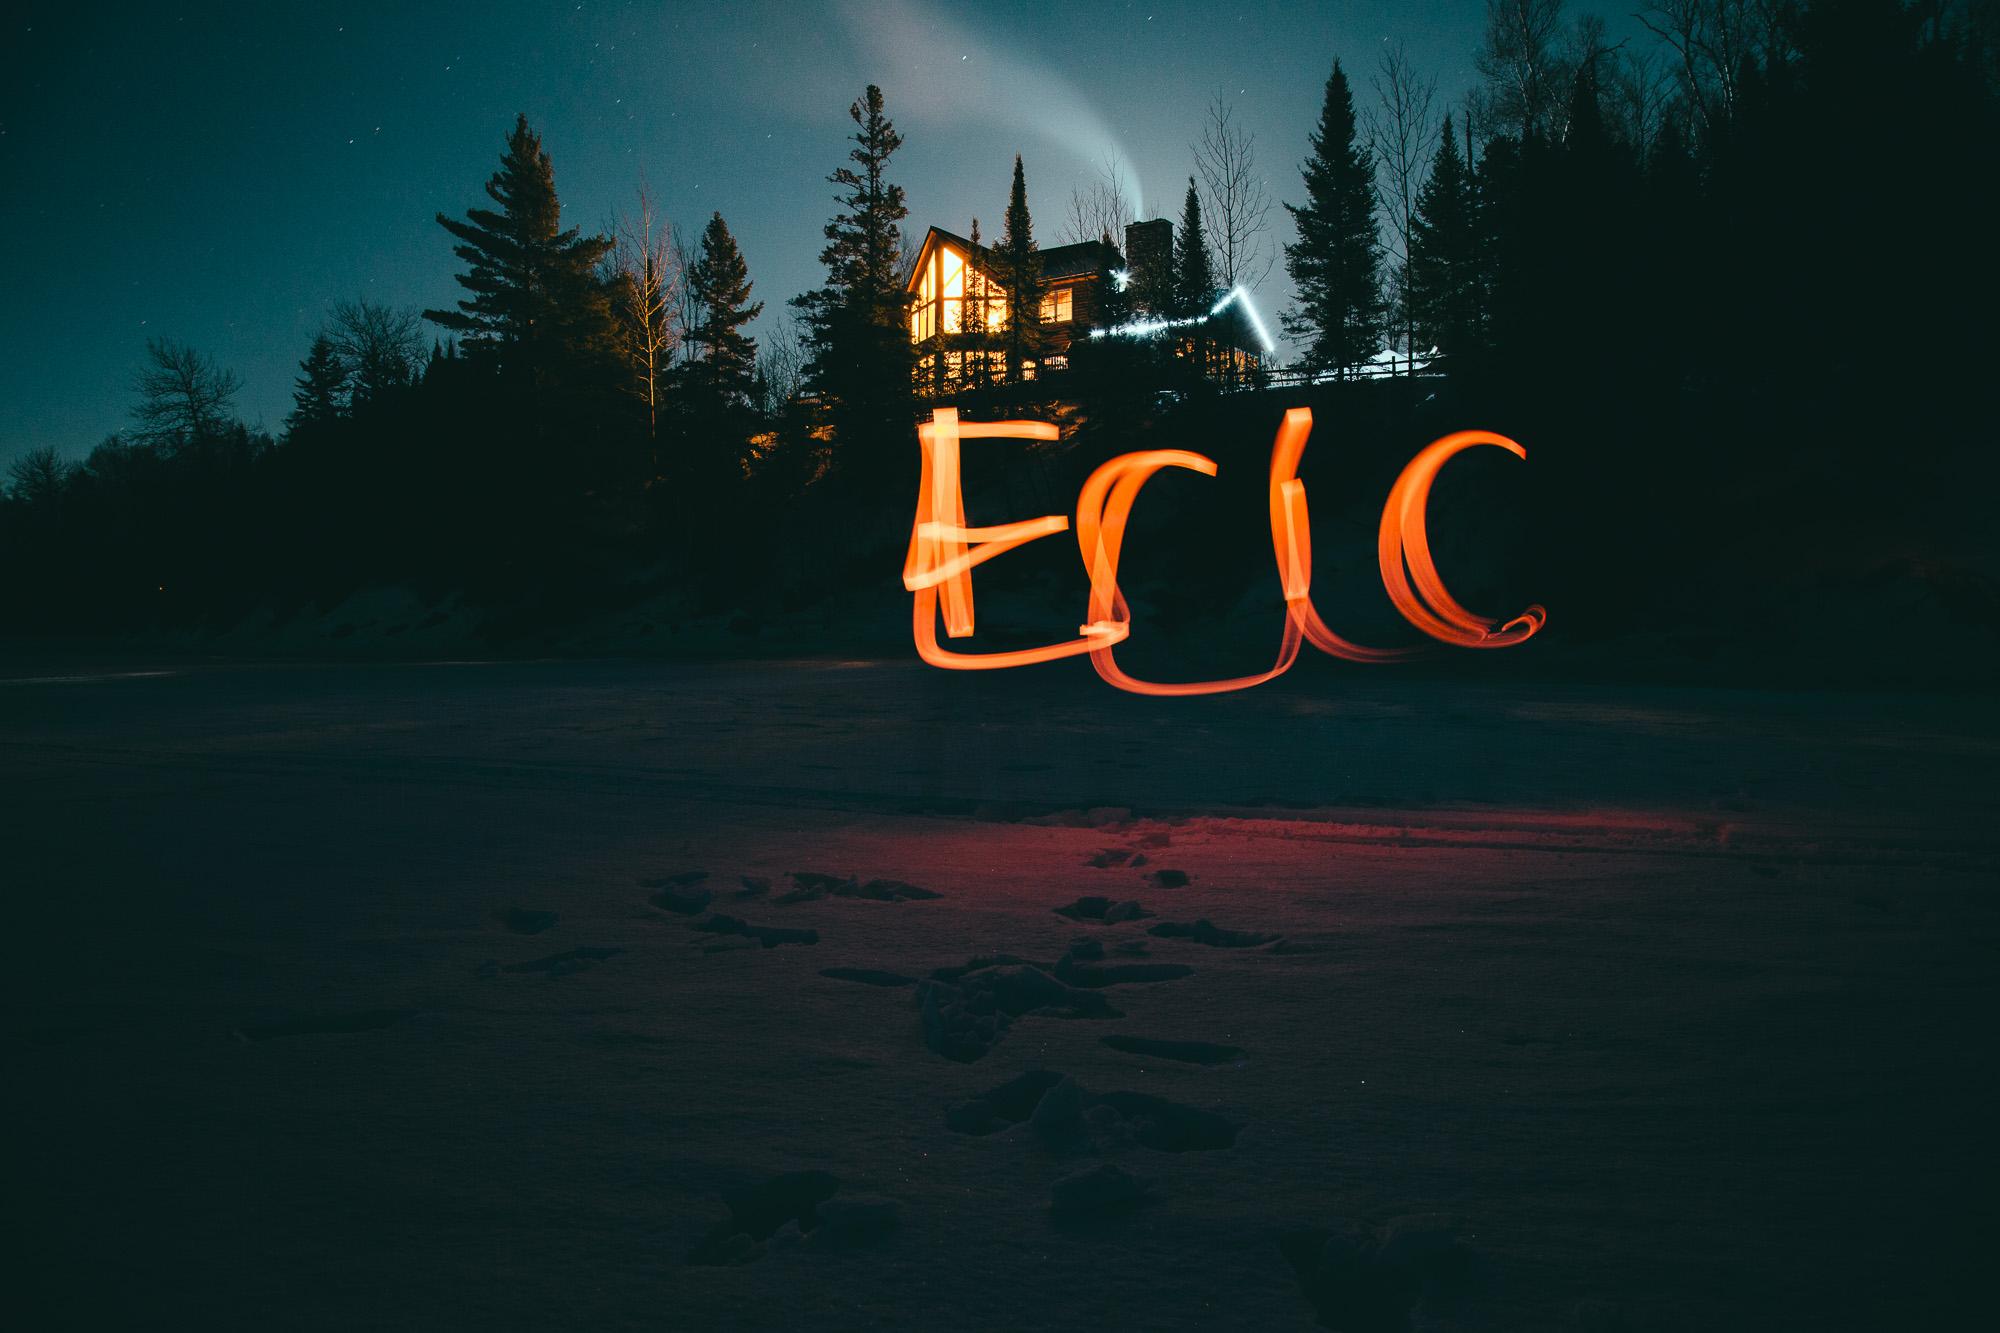 Eric light painting